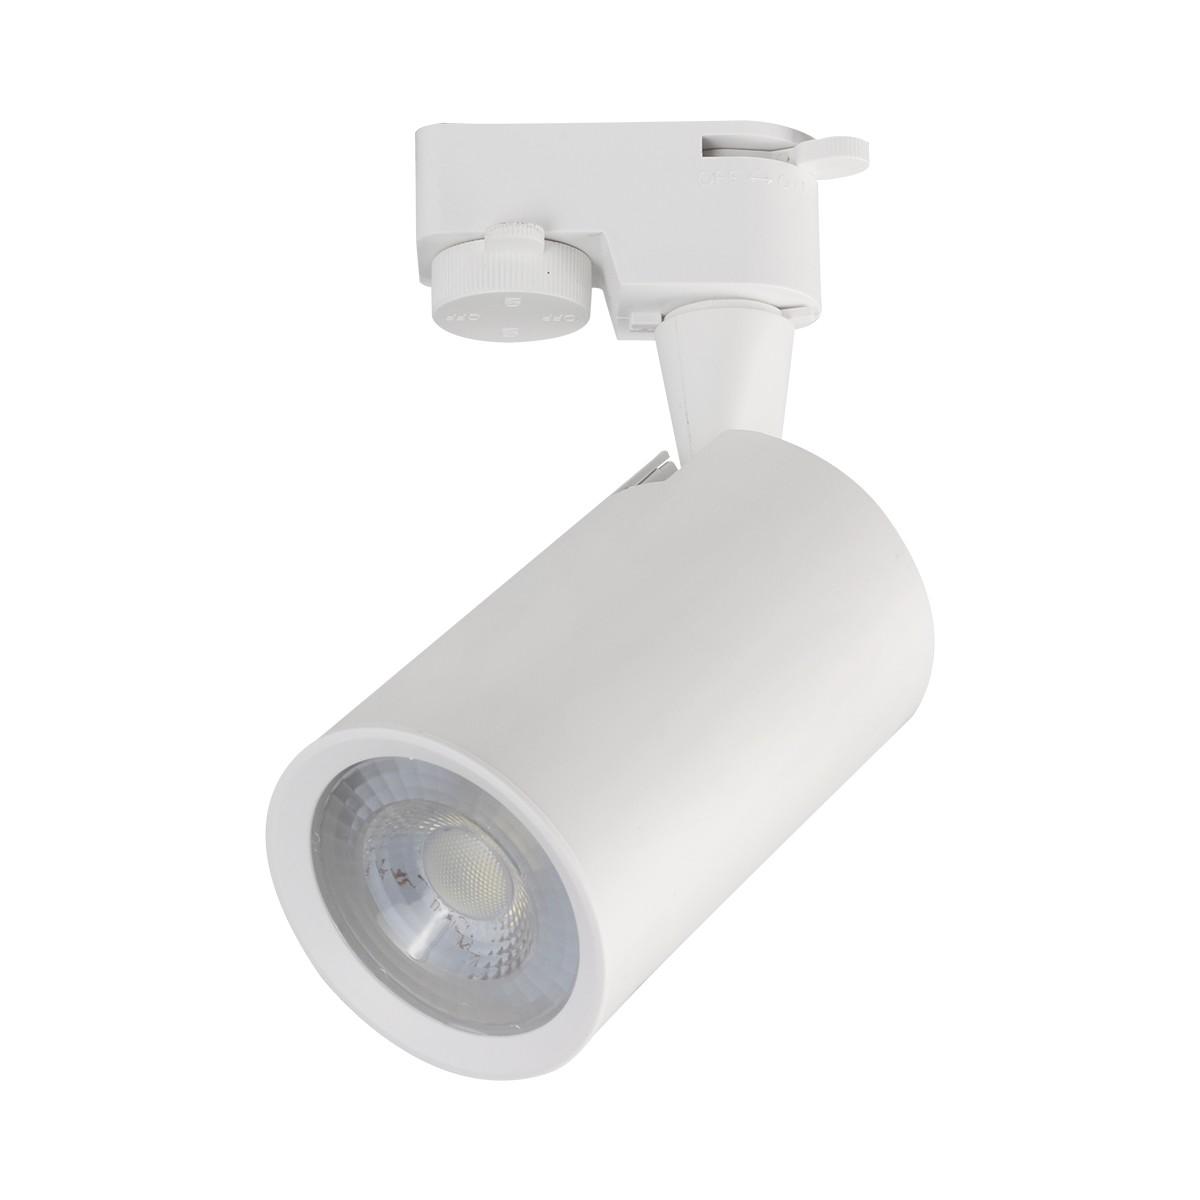 Spot LED Branco Aluminio 5W Luz Amarela 65lm - Luminatti